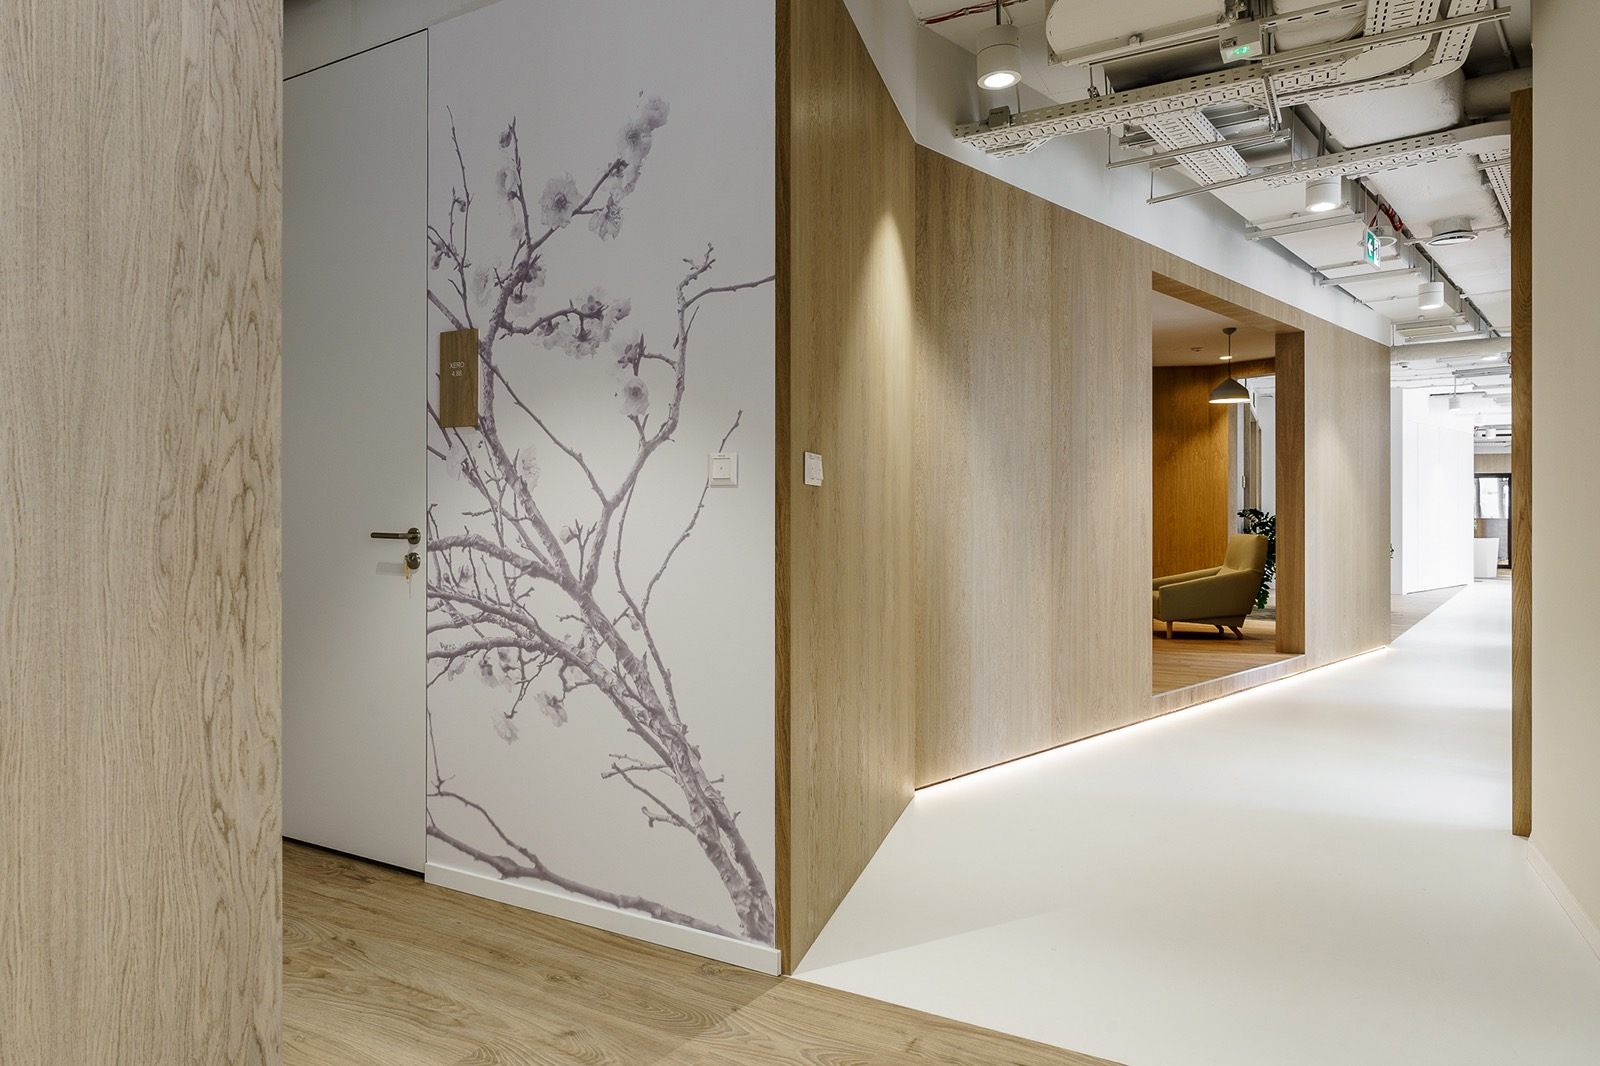 takeda-warsaw-office-5